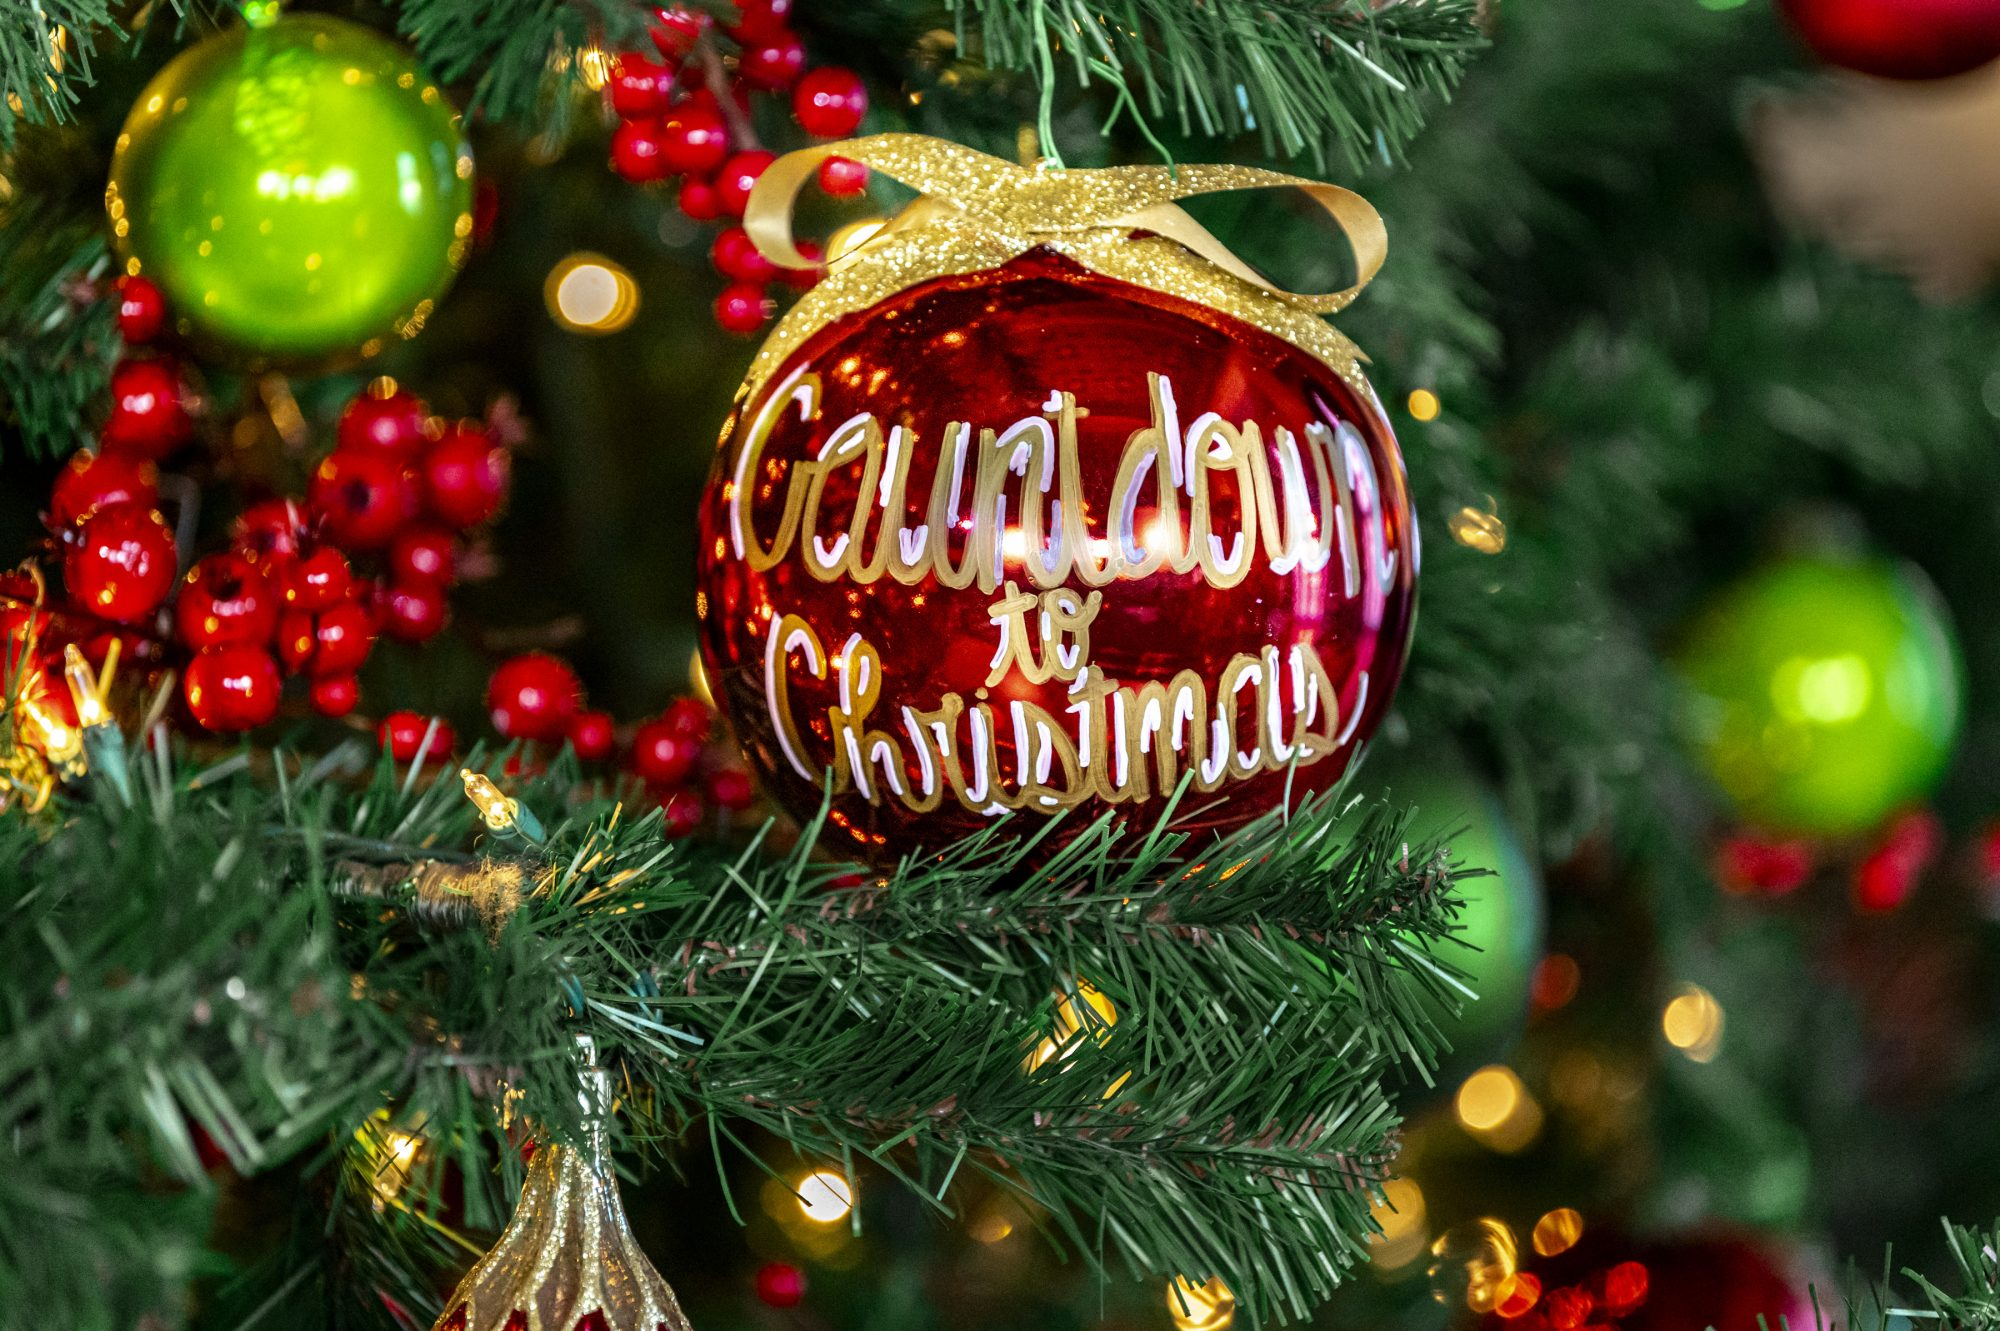 Hallmark Christmas 2021 Countdown To Includes 41 Holiday Movies!